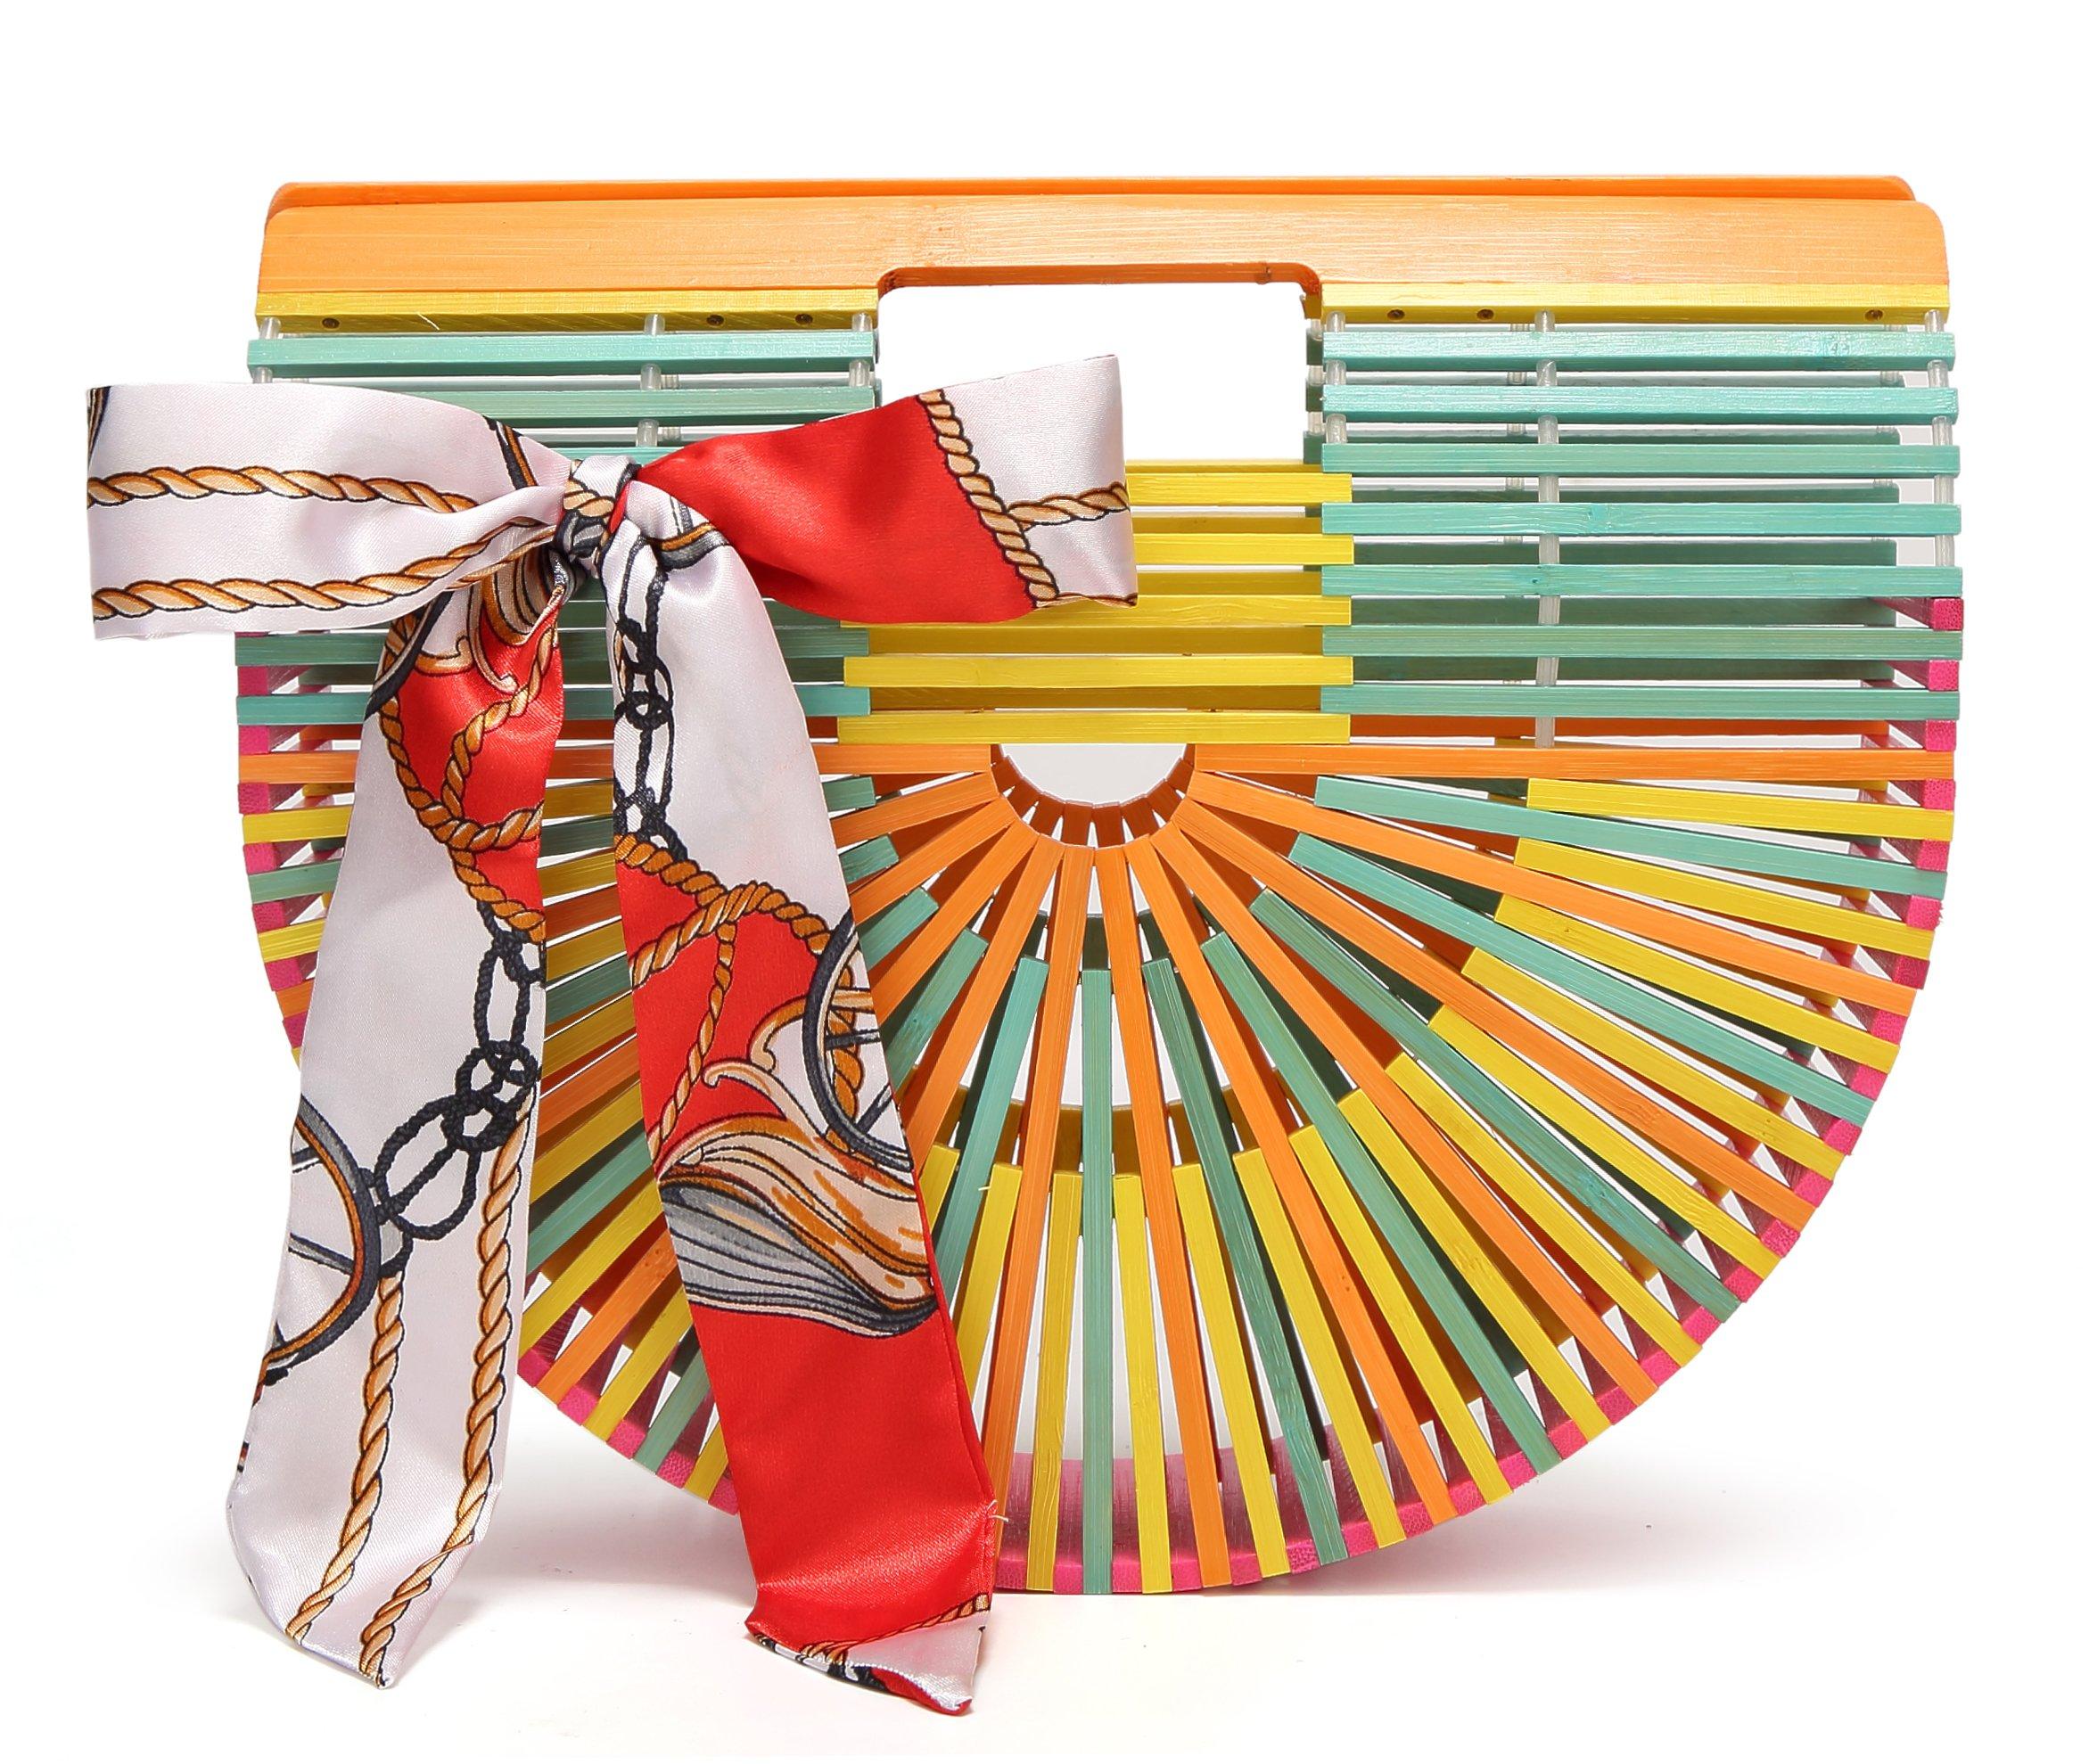 Obosoyo Women's Handmade Bamboo Handbag Summer Beach Sea Tote Bag Multicoloured Small